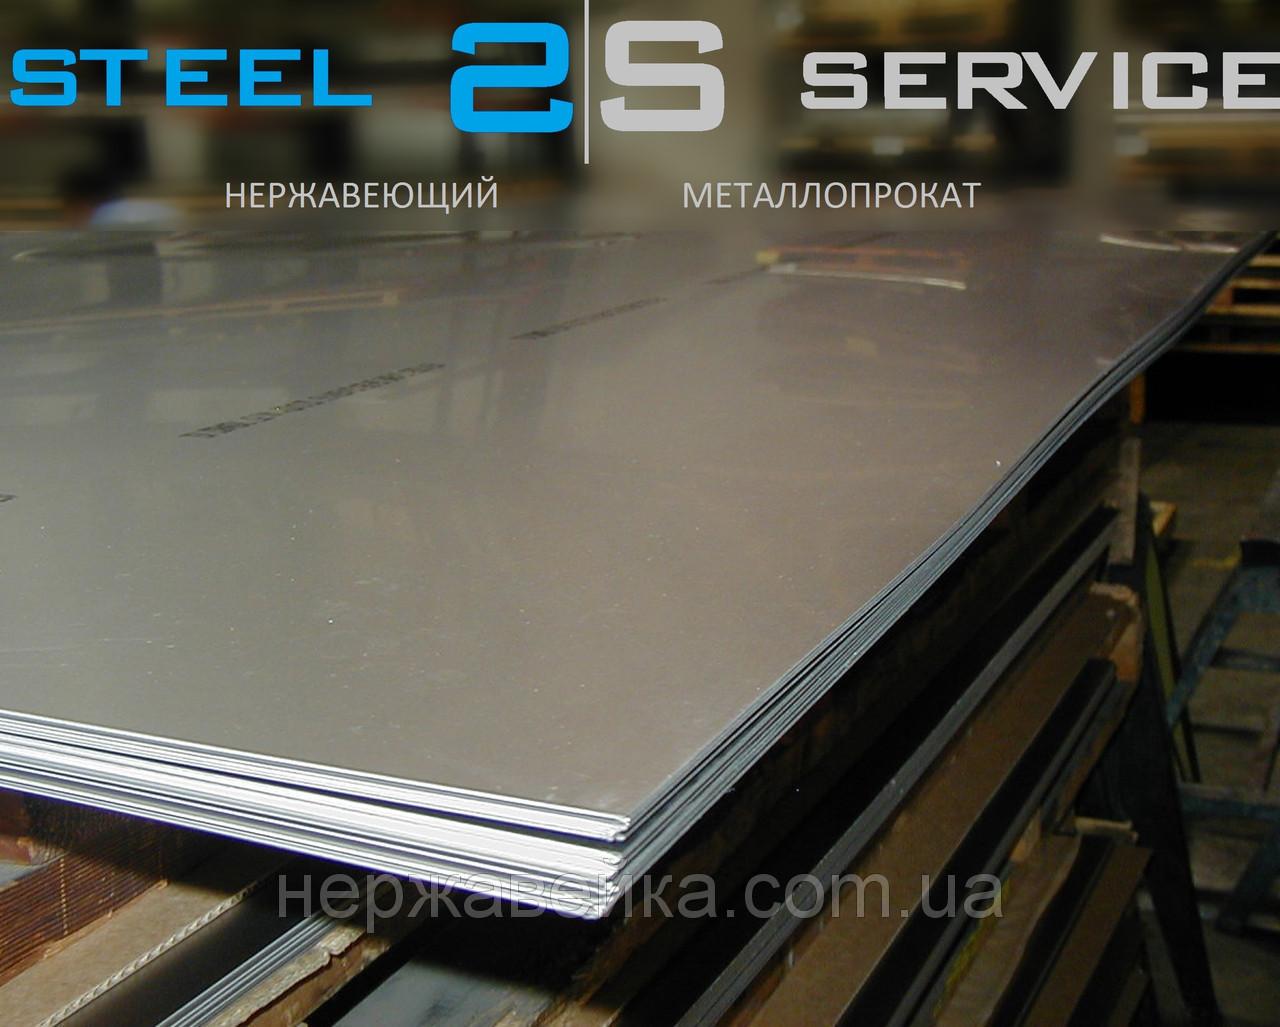 Нержавейка лист 0,8х1250х2500мм  AISI 316Ti(10Х17Н13М2Т) 2B - матовый,  кислотостойкий